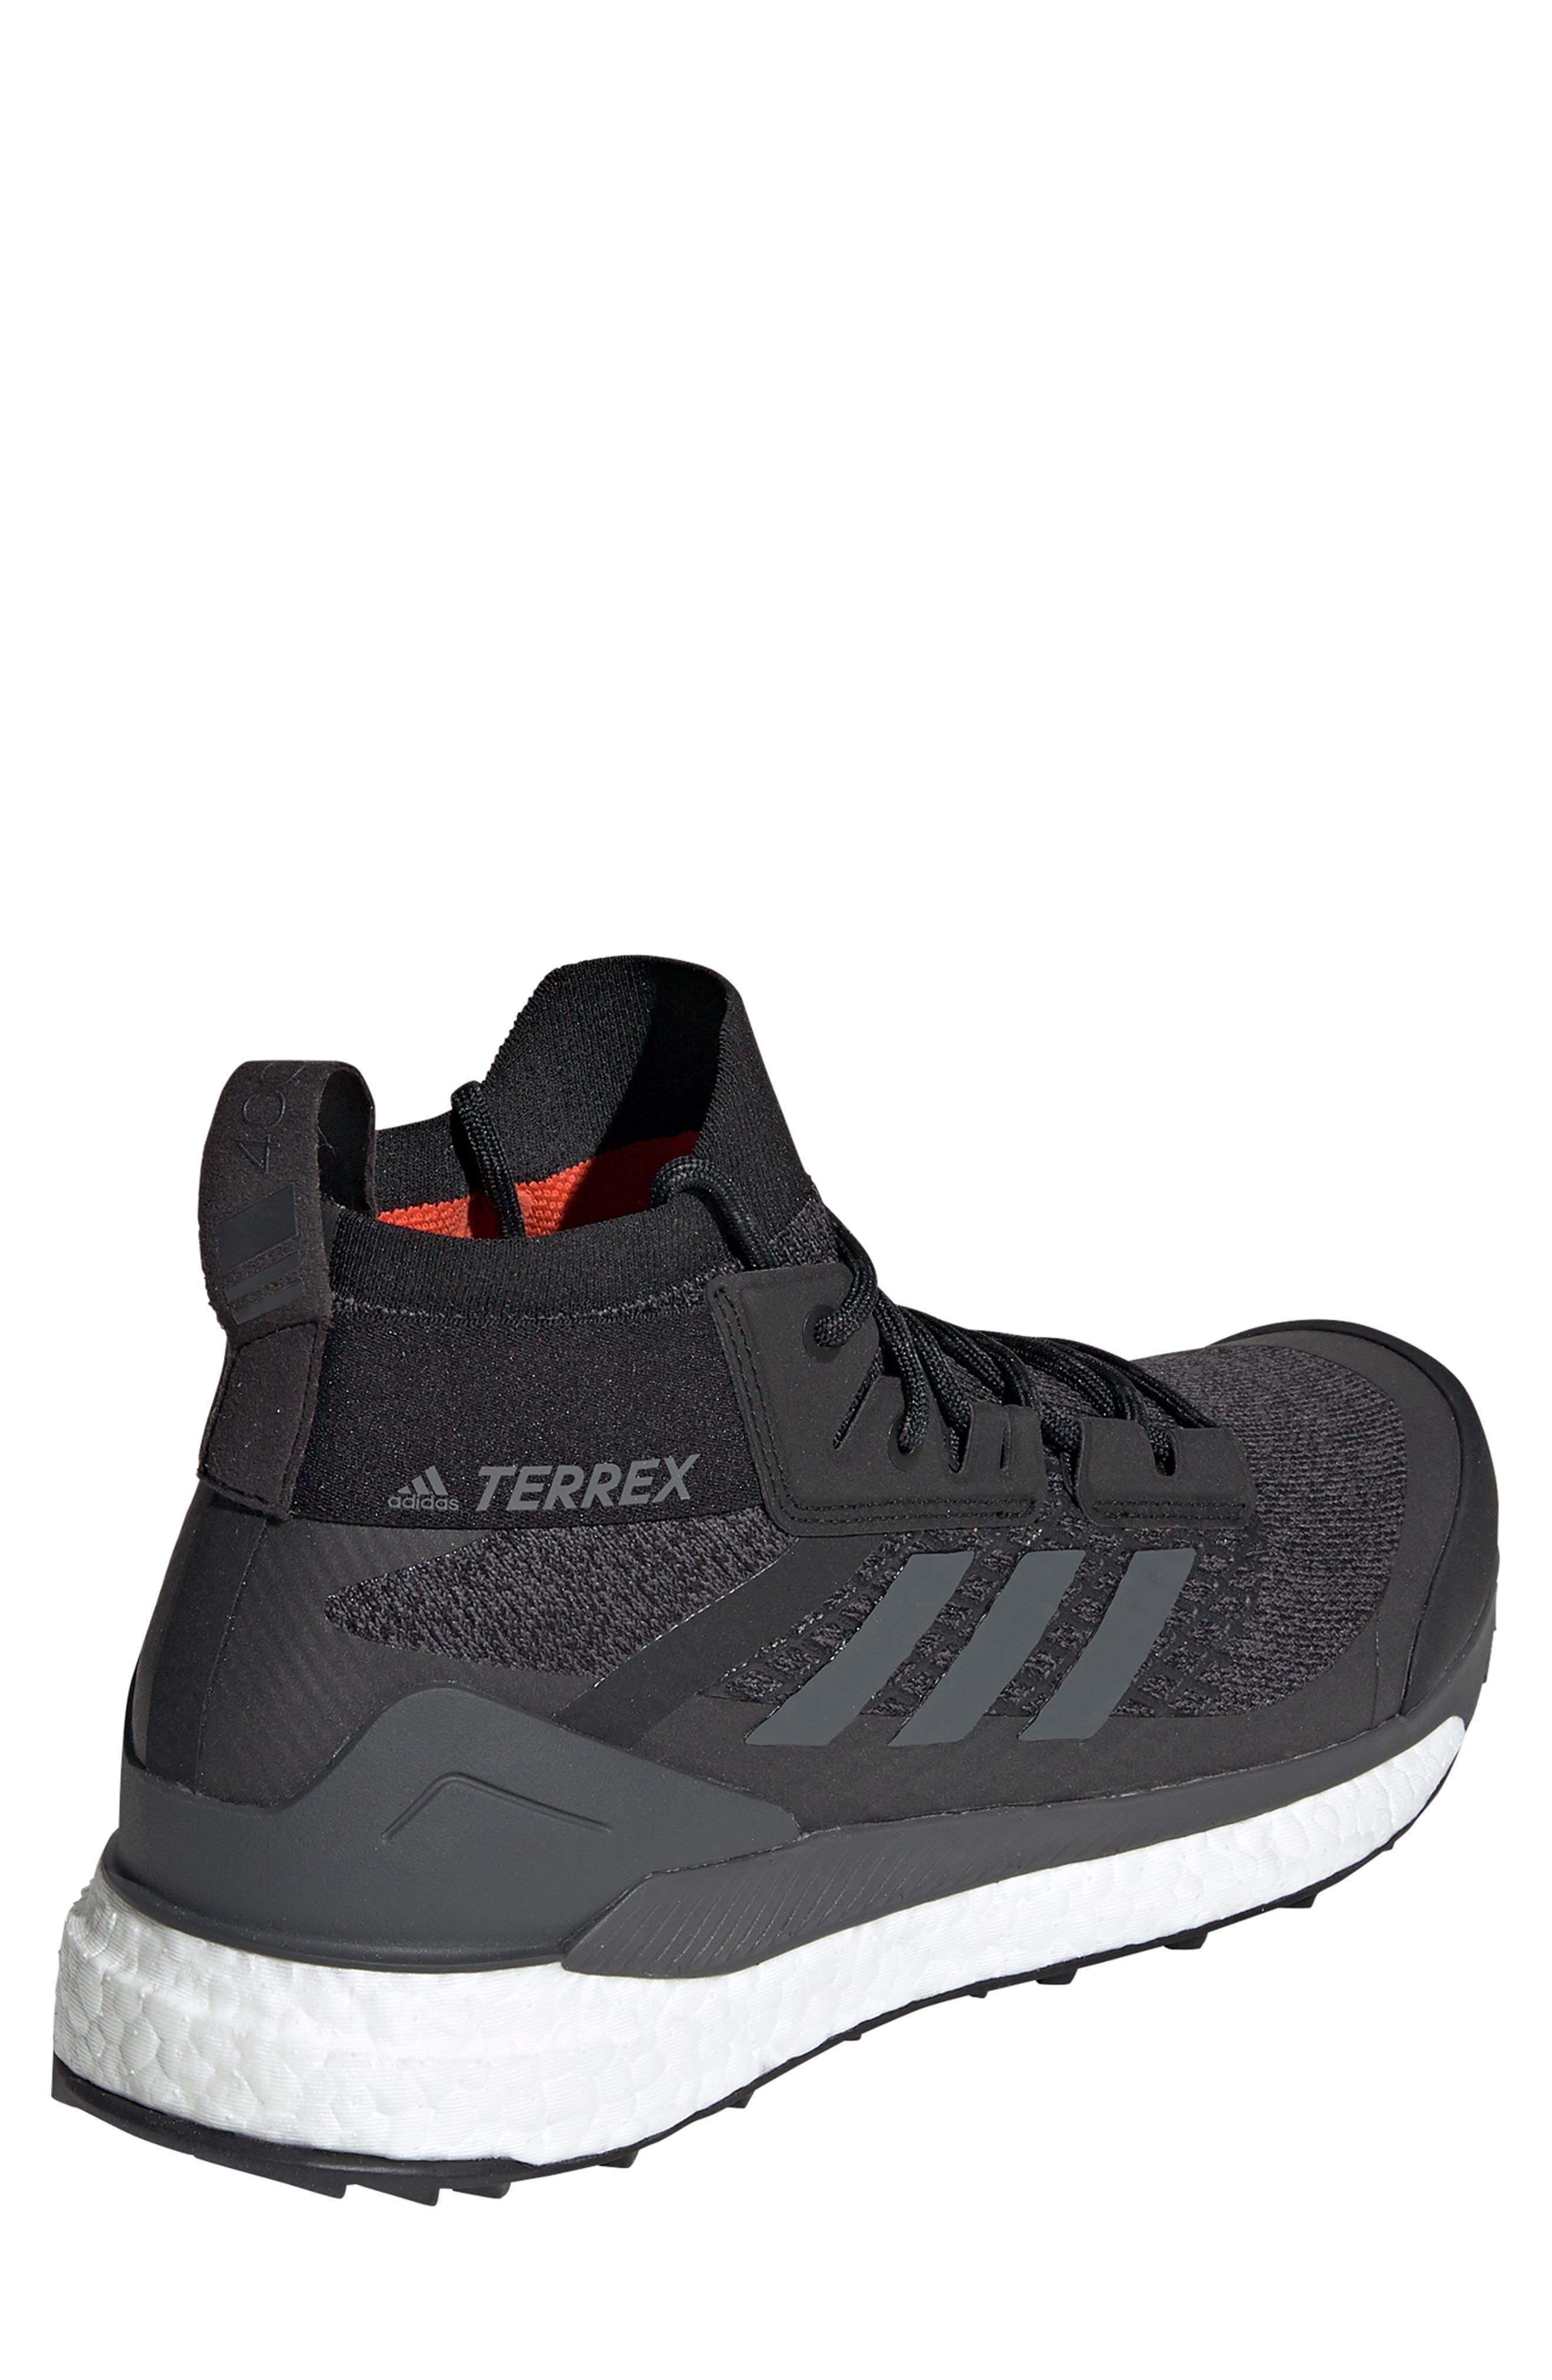 4573bf70407 Men s Adidas Athletic Sneakers